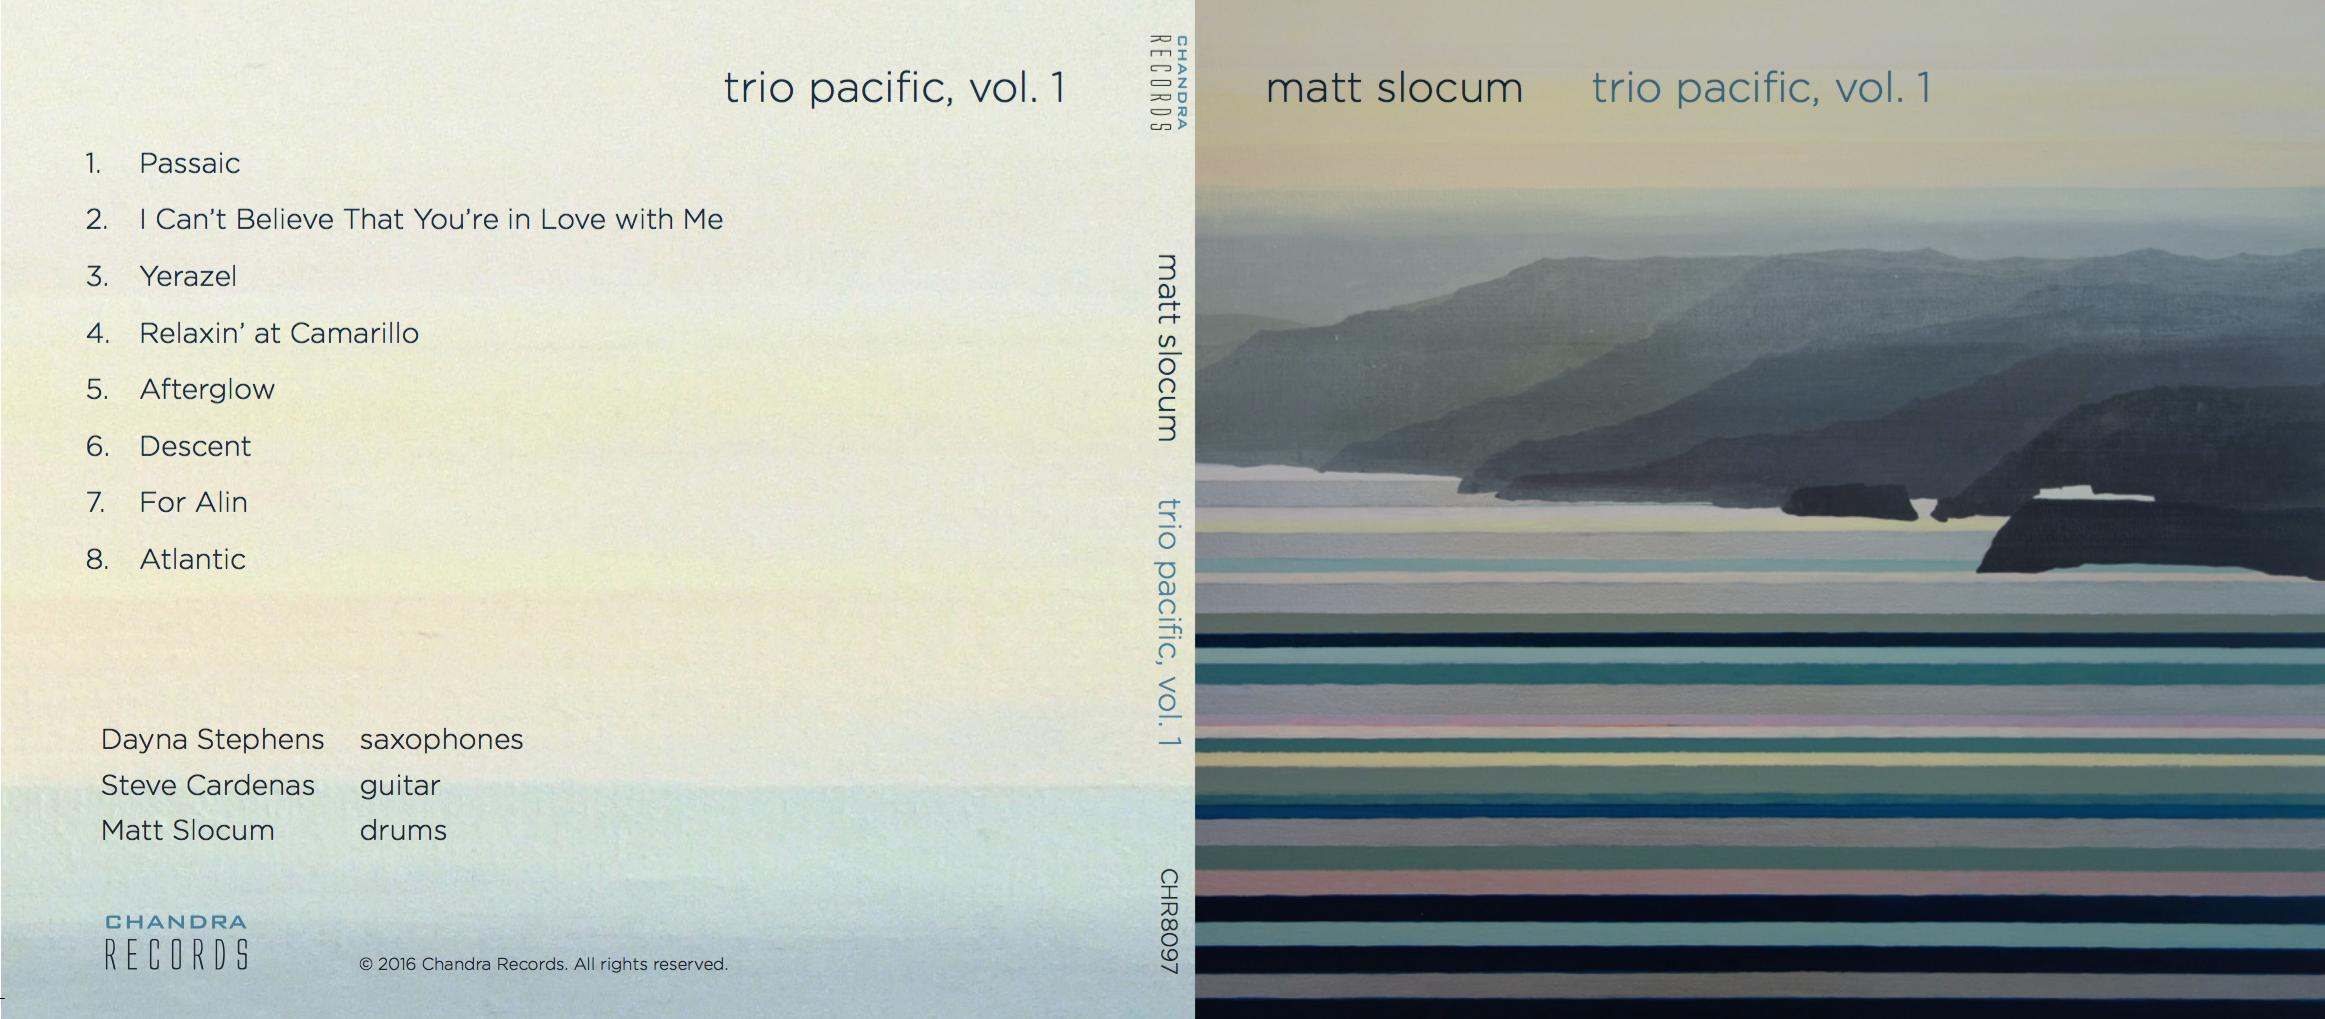 https://news.allaboutjazz.com/matt-slocum-presents-trio-pacific-vol-1-featuring-dayna-stephens-steve-cardenas-and-matt-slocum.php